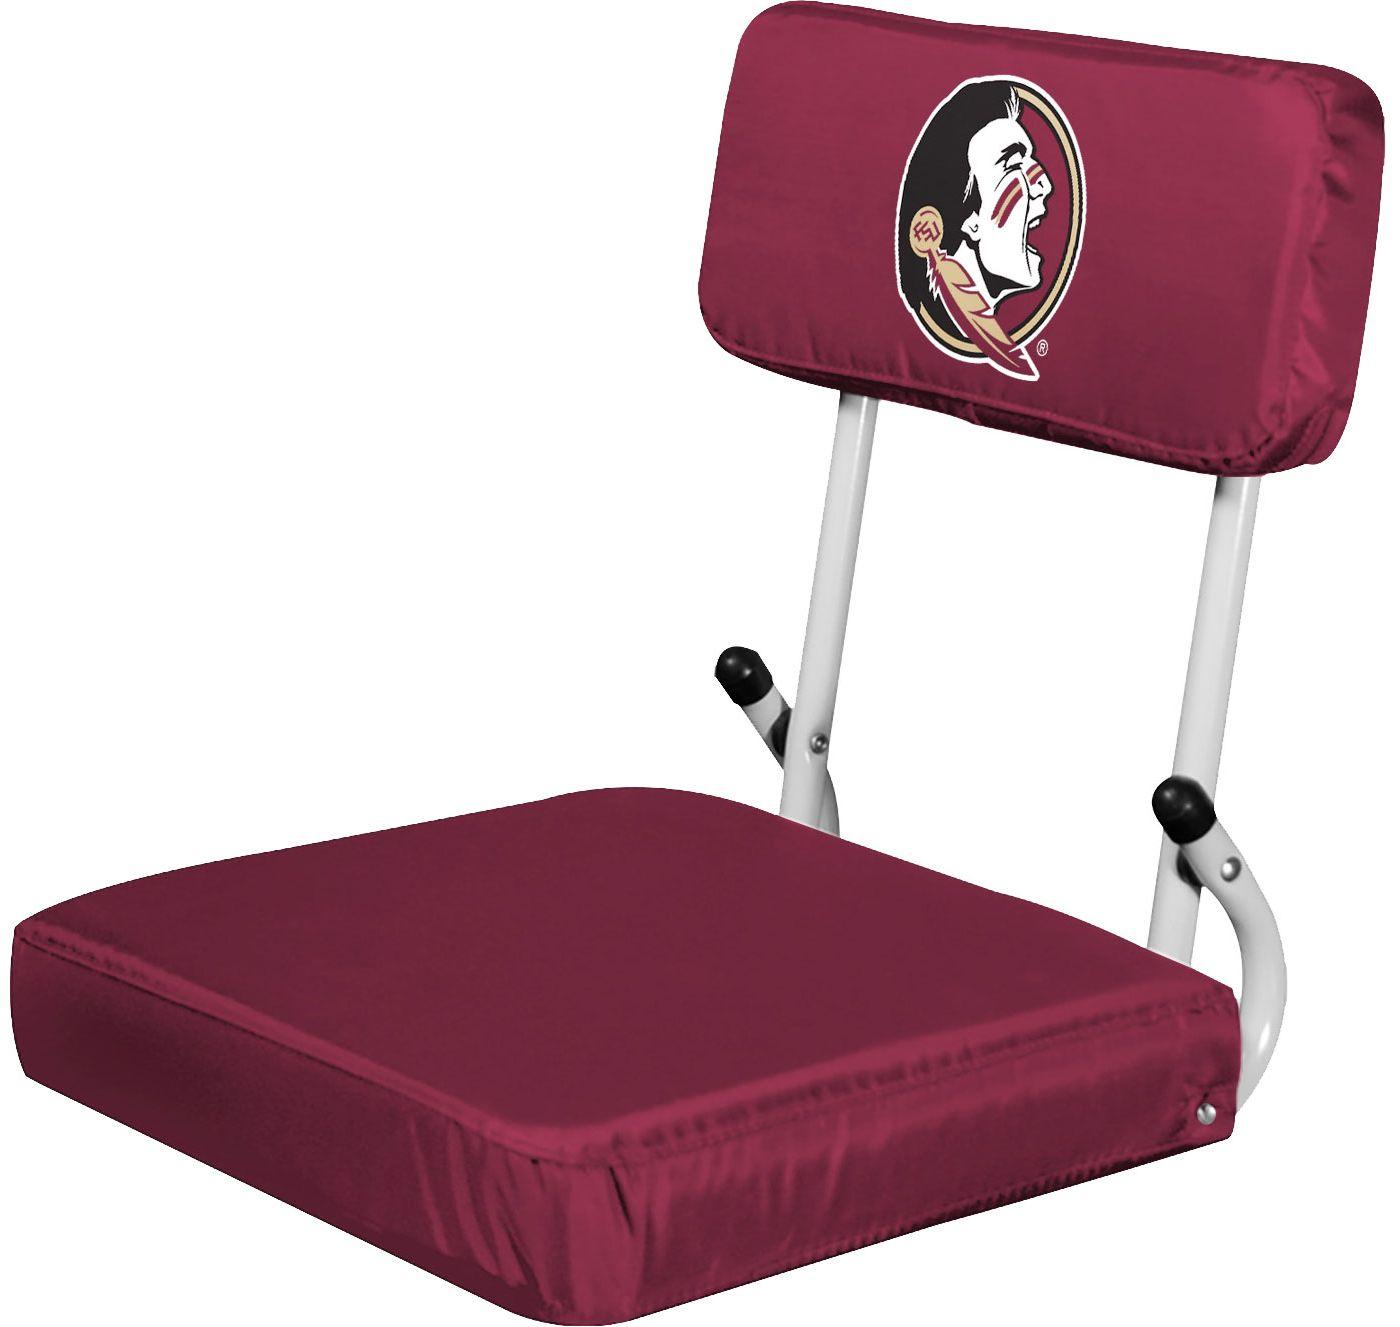 Florida State Seminoles Hardback Stadium Seat